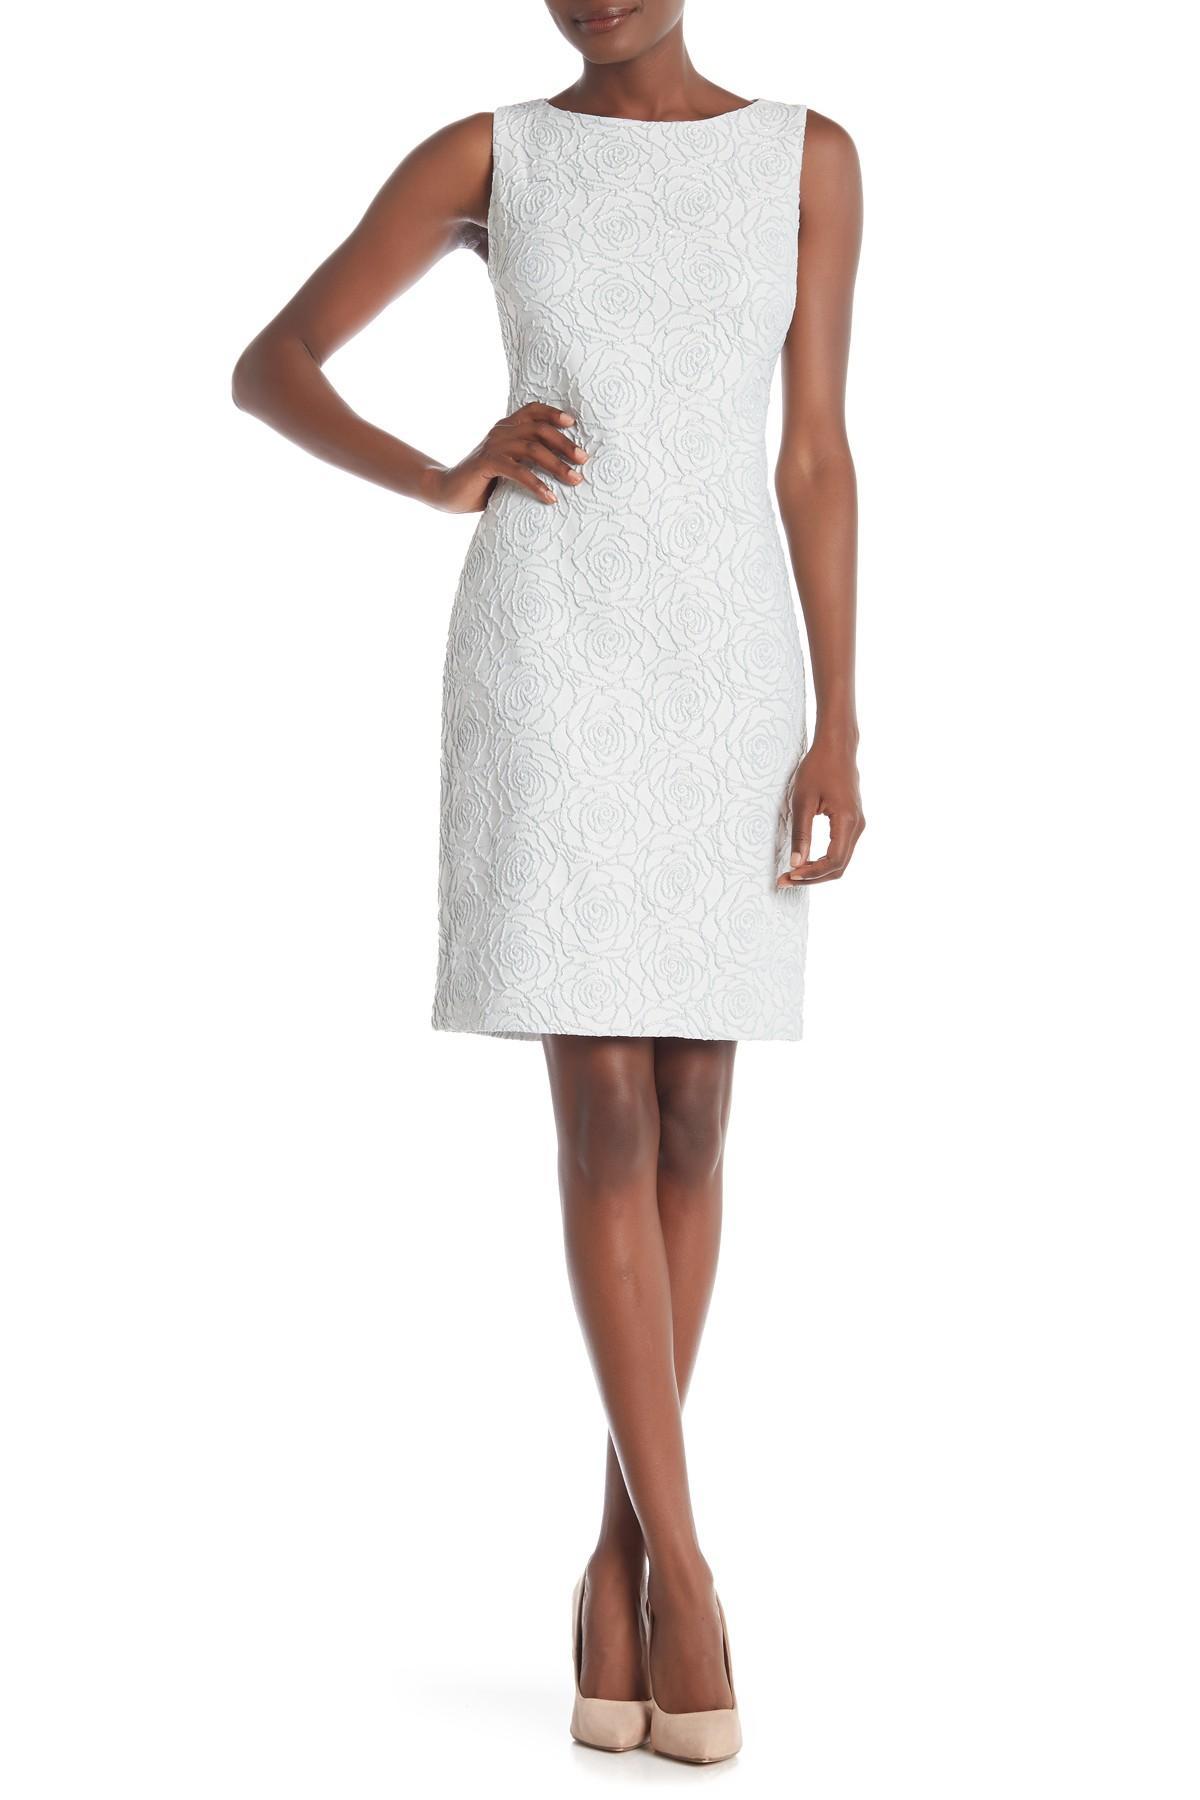 ac6de15020a63 Lyst - Donna Ricco Textured Sleeveless Dress in White